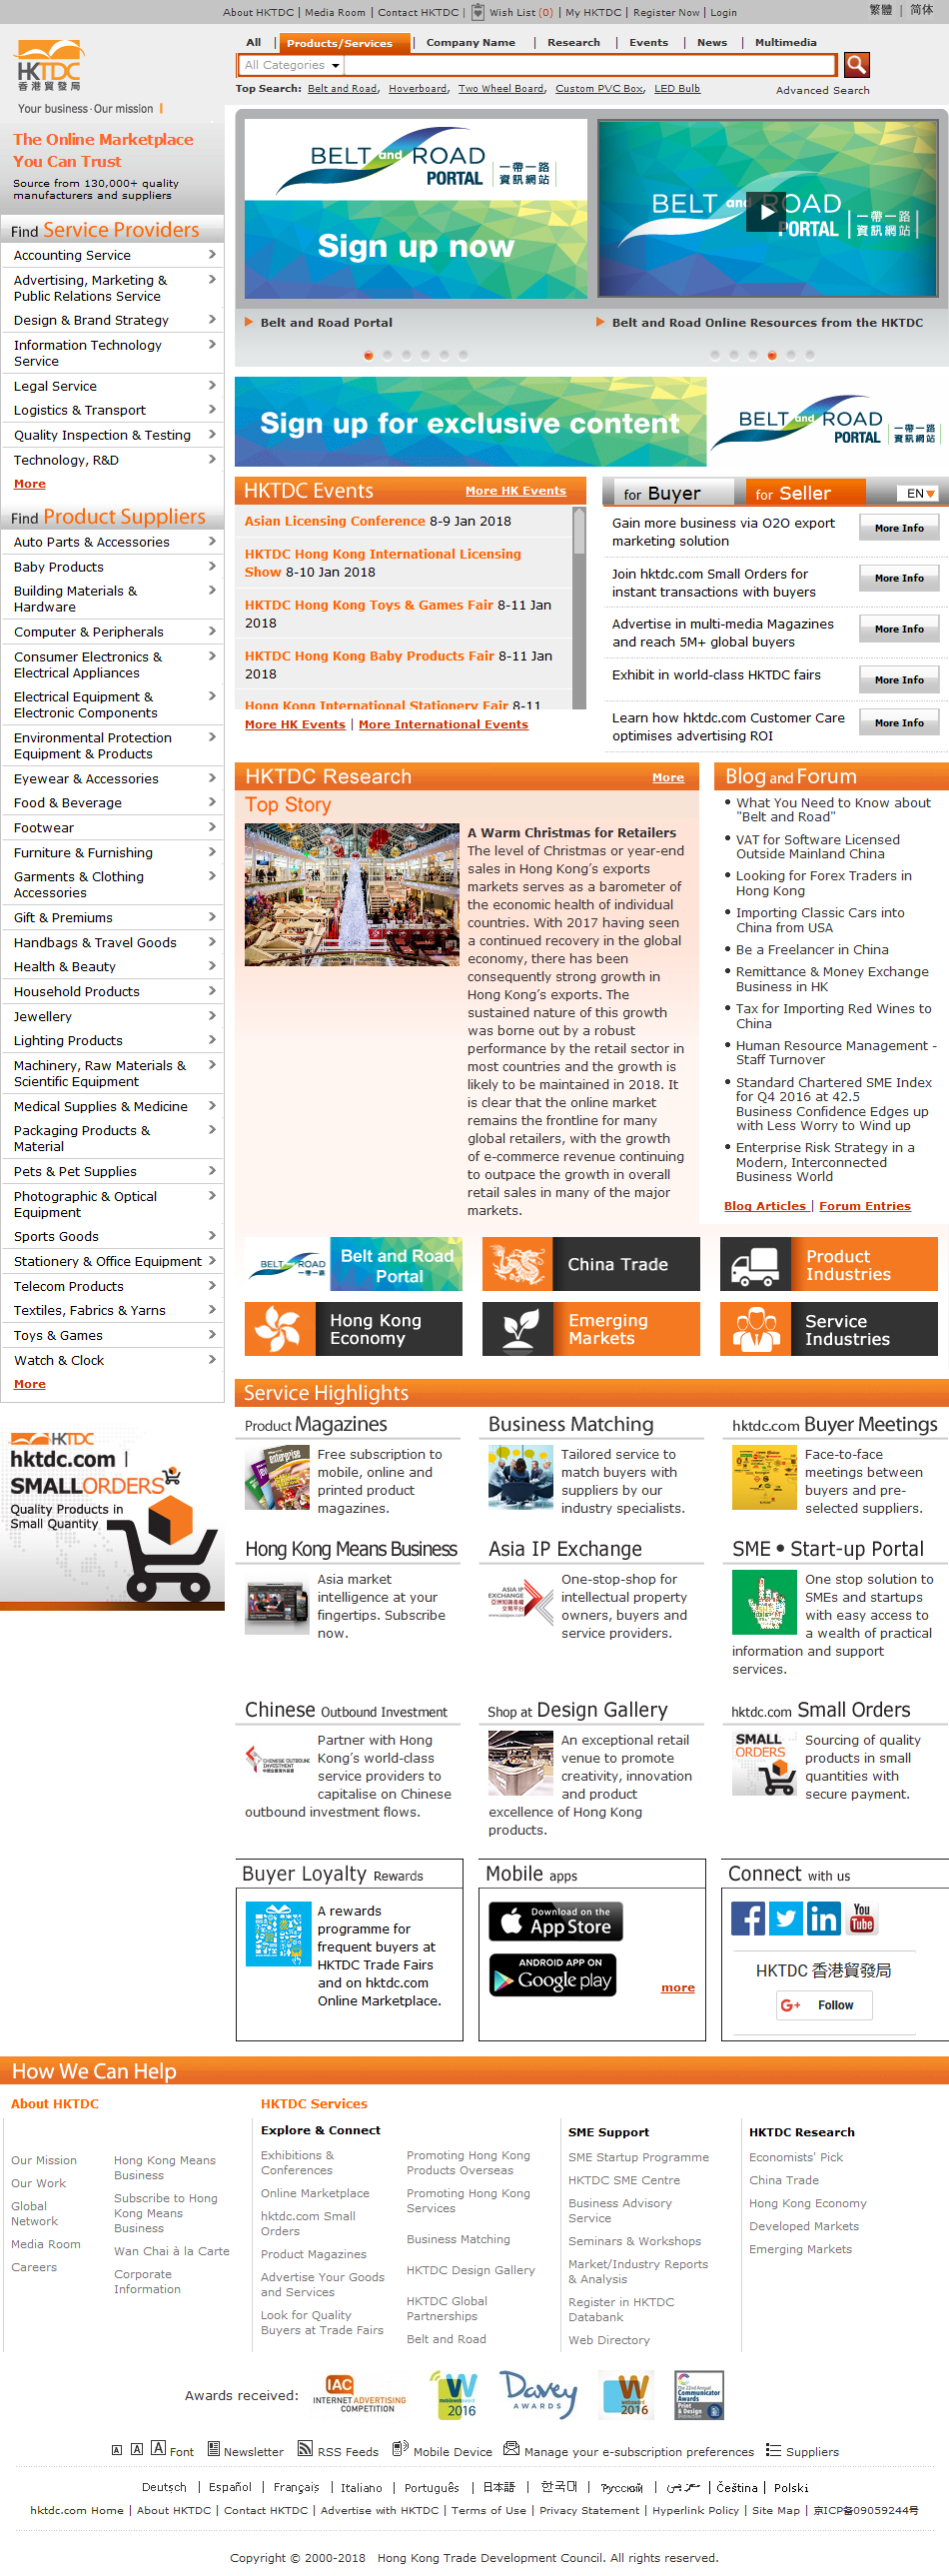 Screenshot-2018-1-4 Hong Kong Suppliers and Hong Kong Manufacturers HKTDC.png